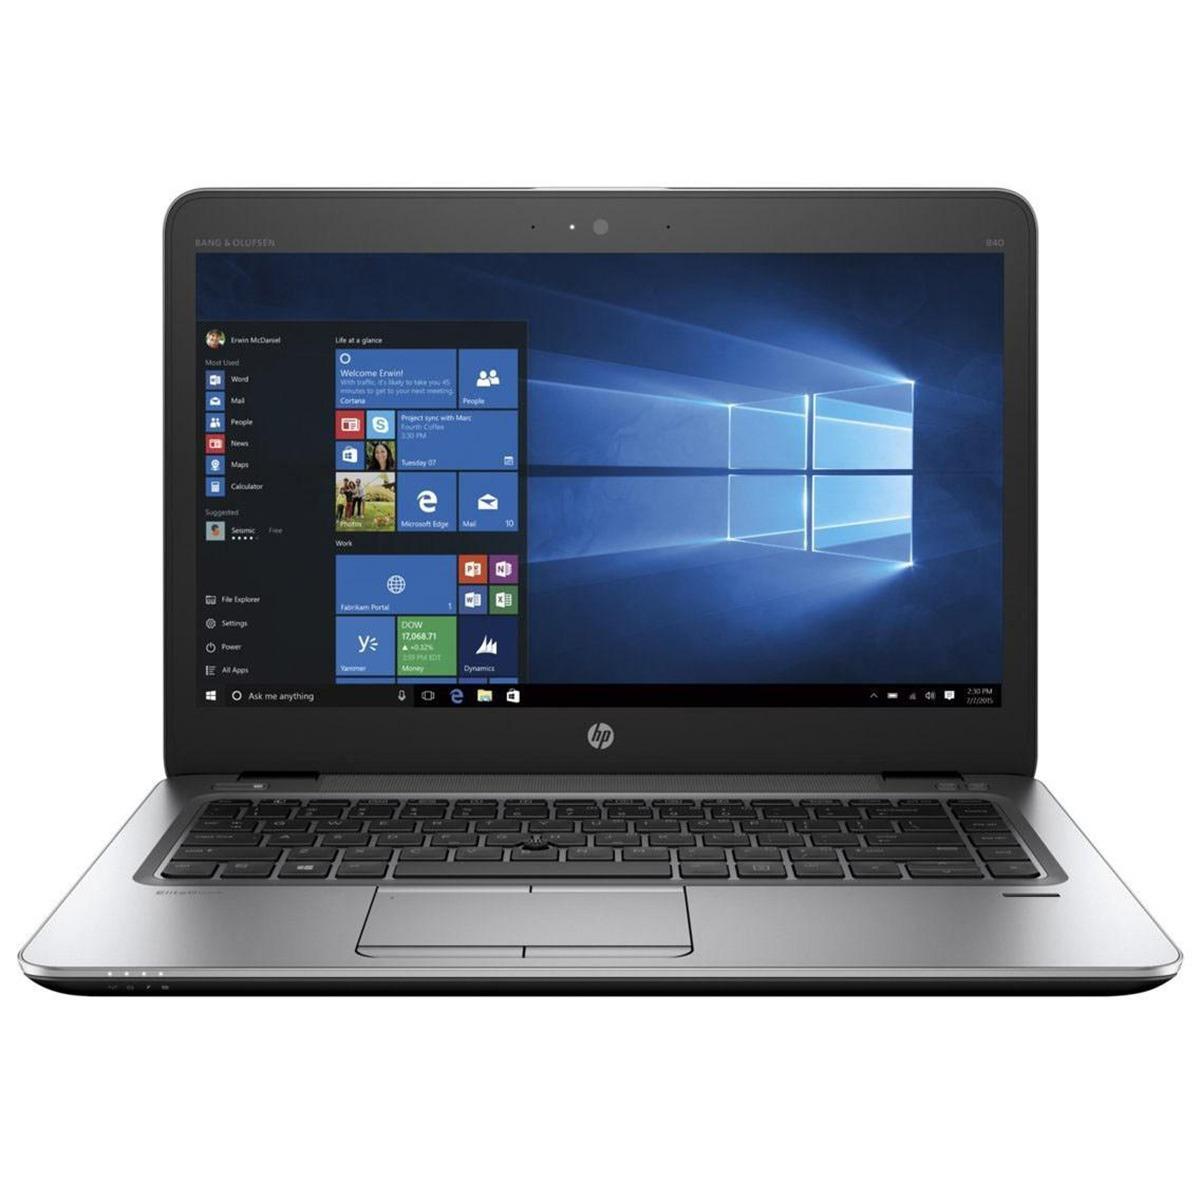 HP Elitebook 840 G3 6th Generation 8GB RAM, 256GB SSD, 14 inch Display LED  Display, LAPTOP